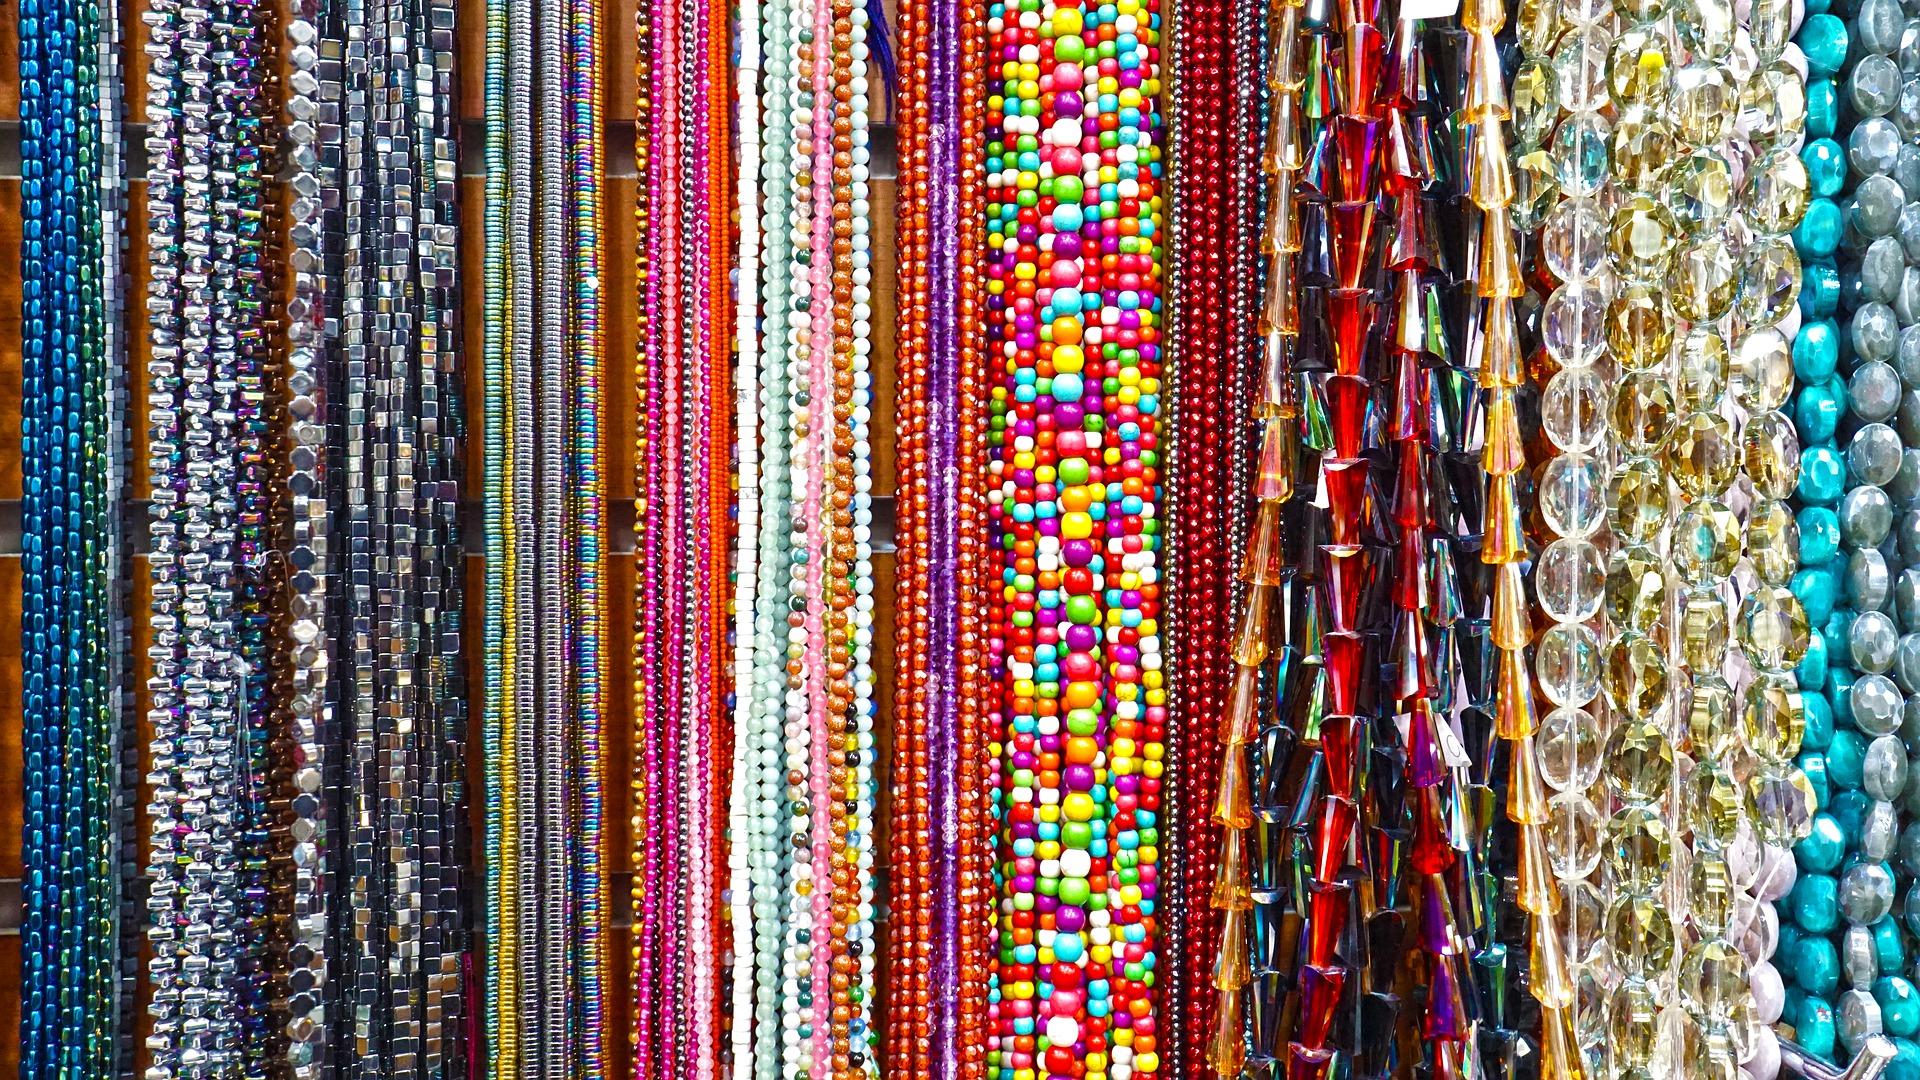 barang perhiasan